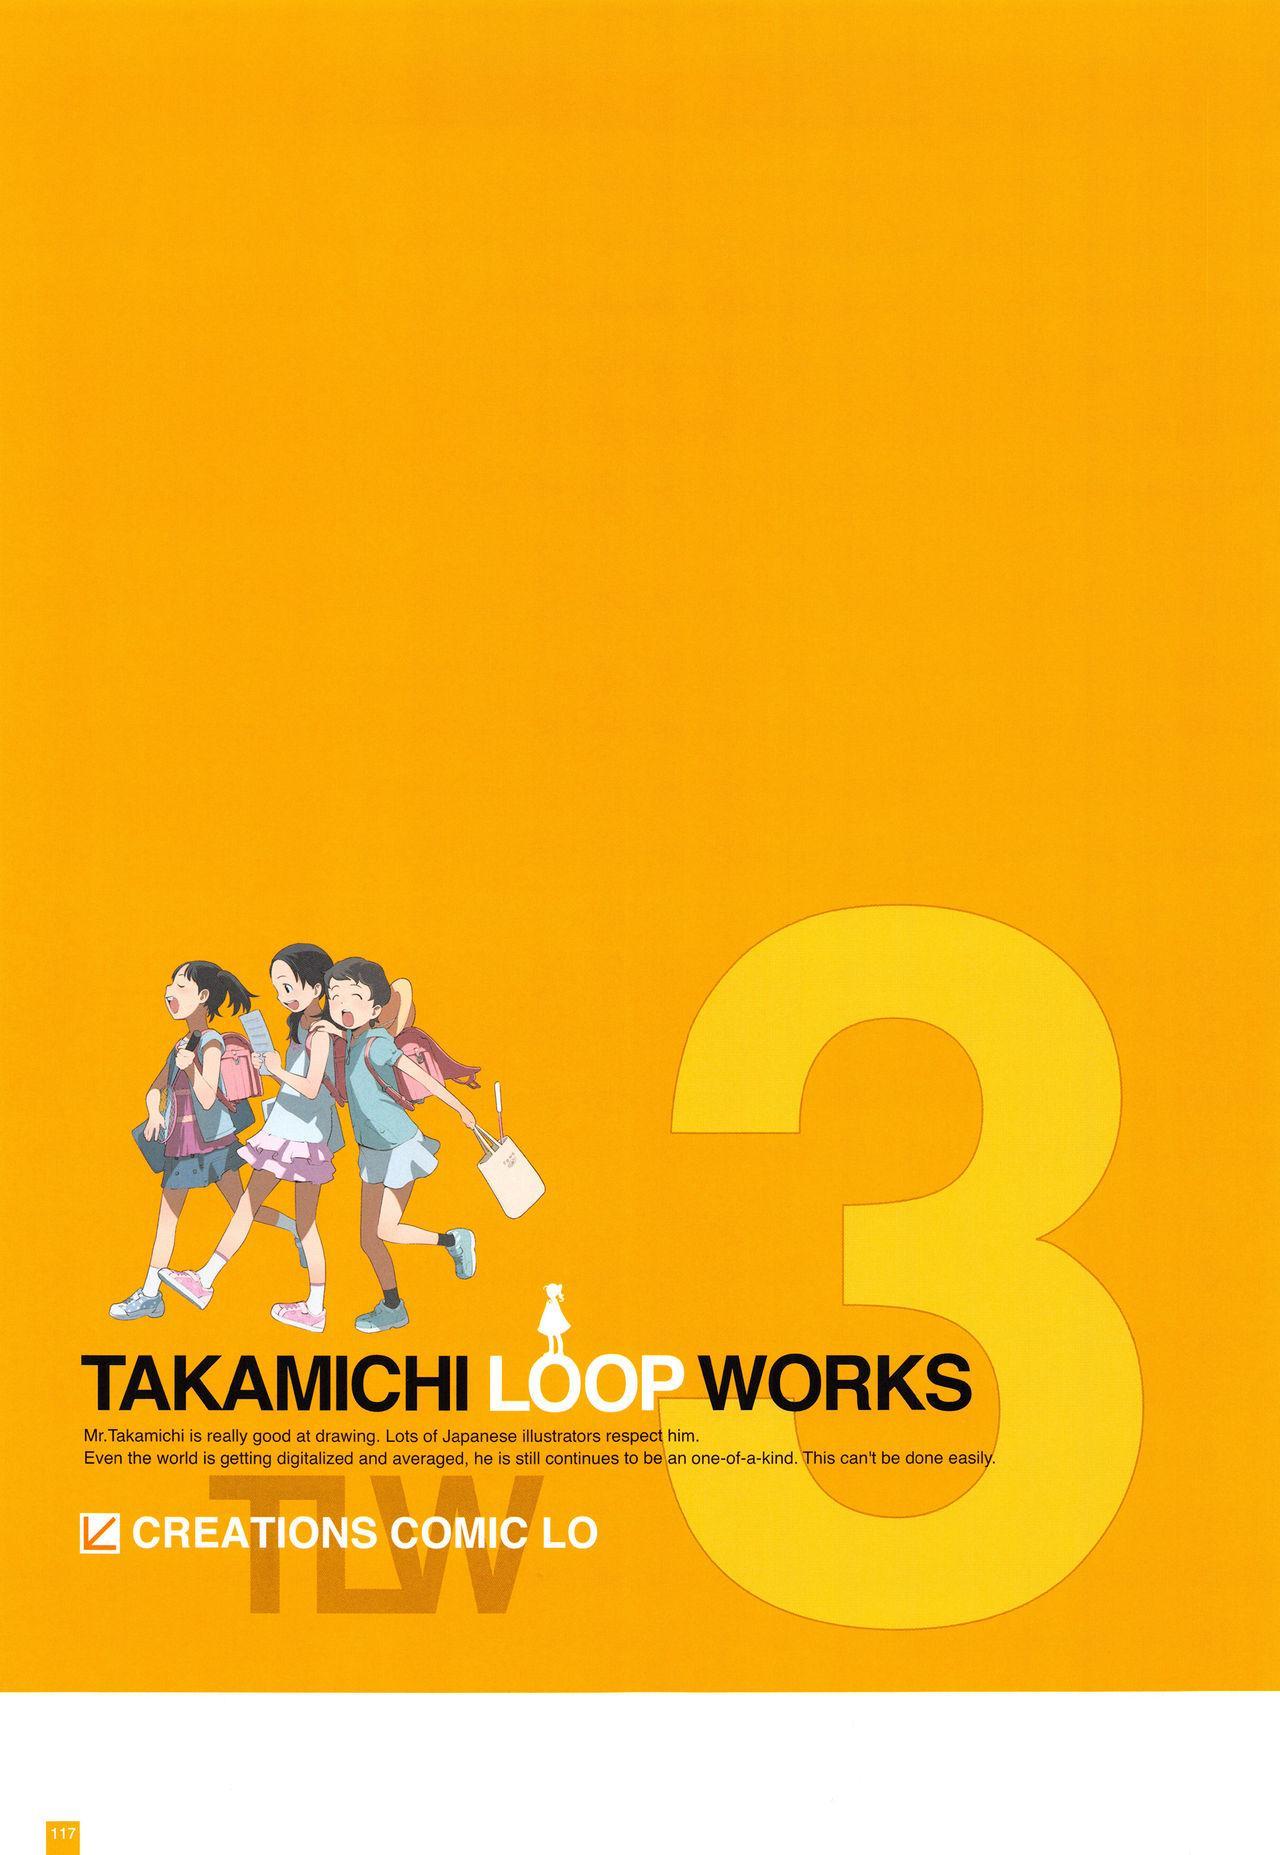 LO Artbook 2-A TAKAMICHI LOOP WORKS 119